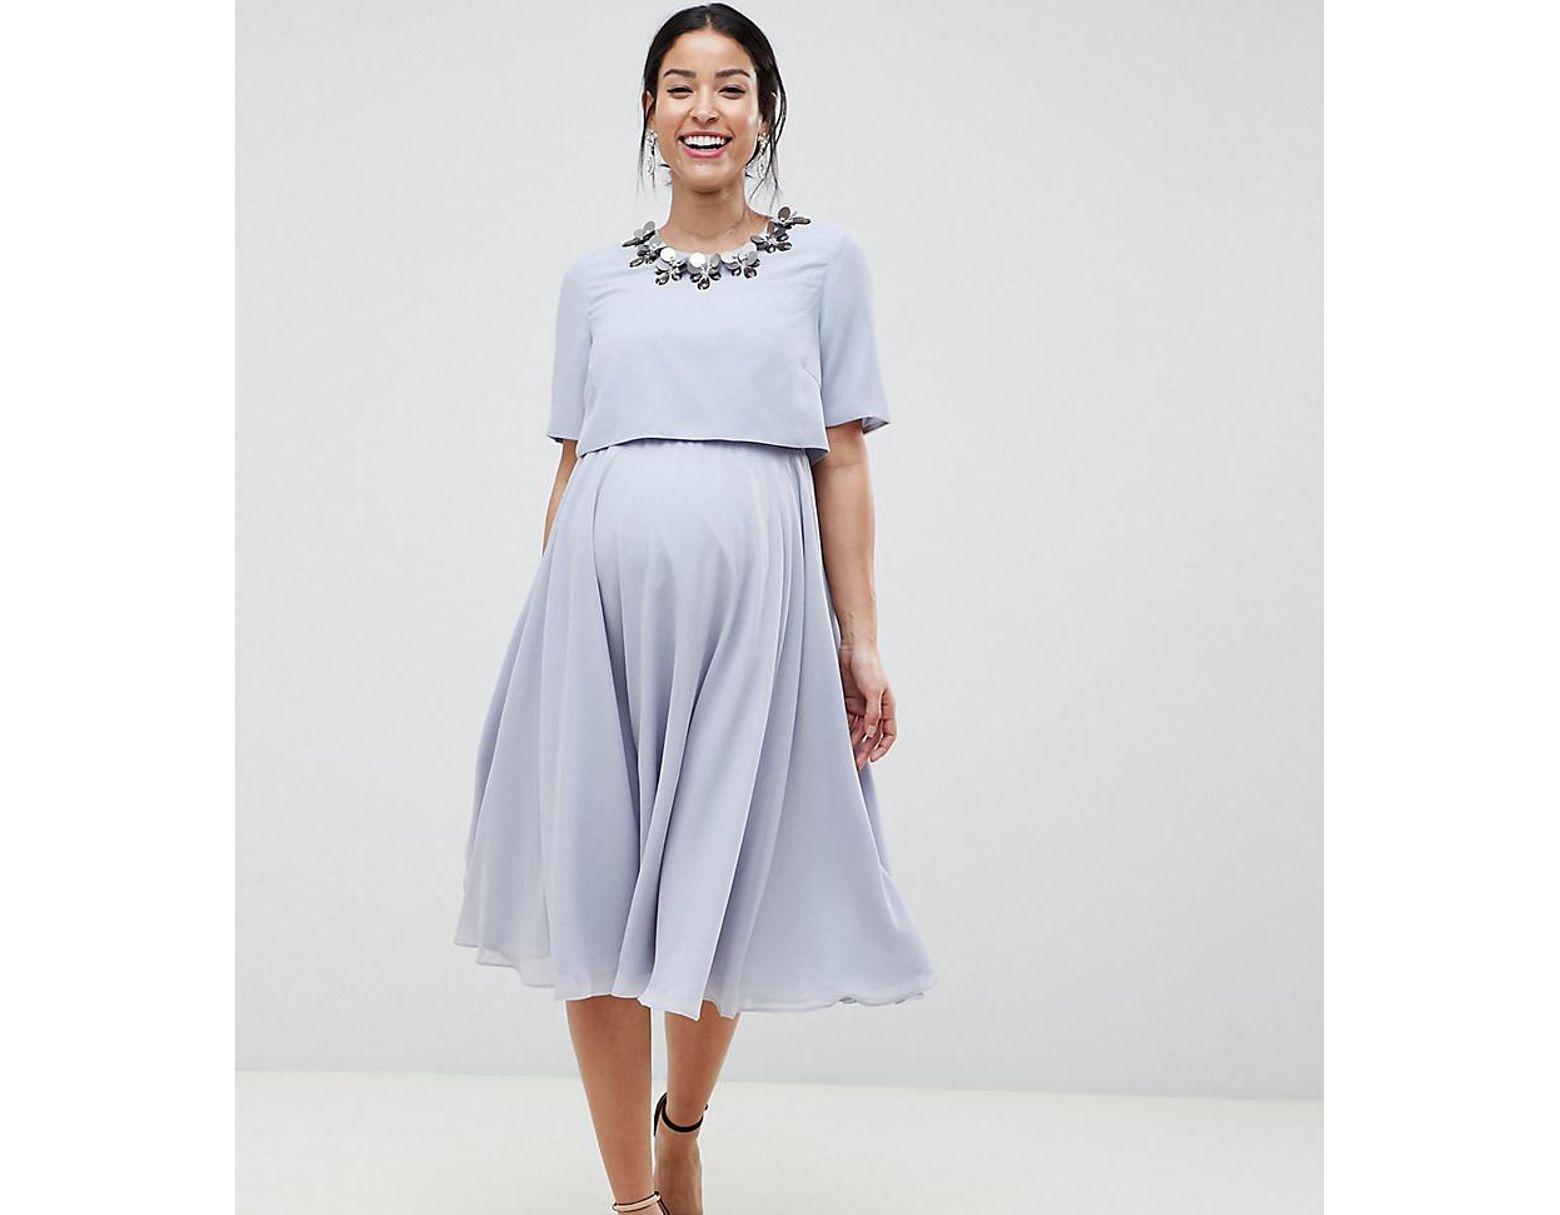 639e592f745e2d ASOS Asos Design Maternity Nursing 3d Embellished Crop Top Midi Skater Dress  in Blue - Lyst